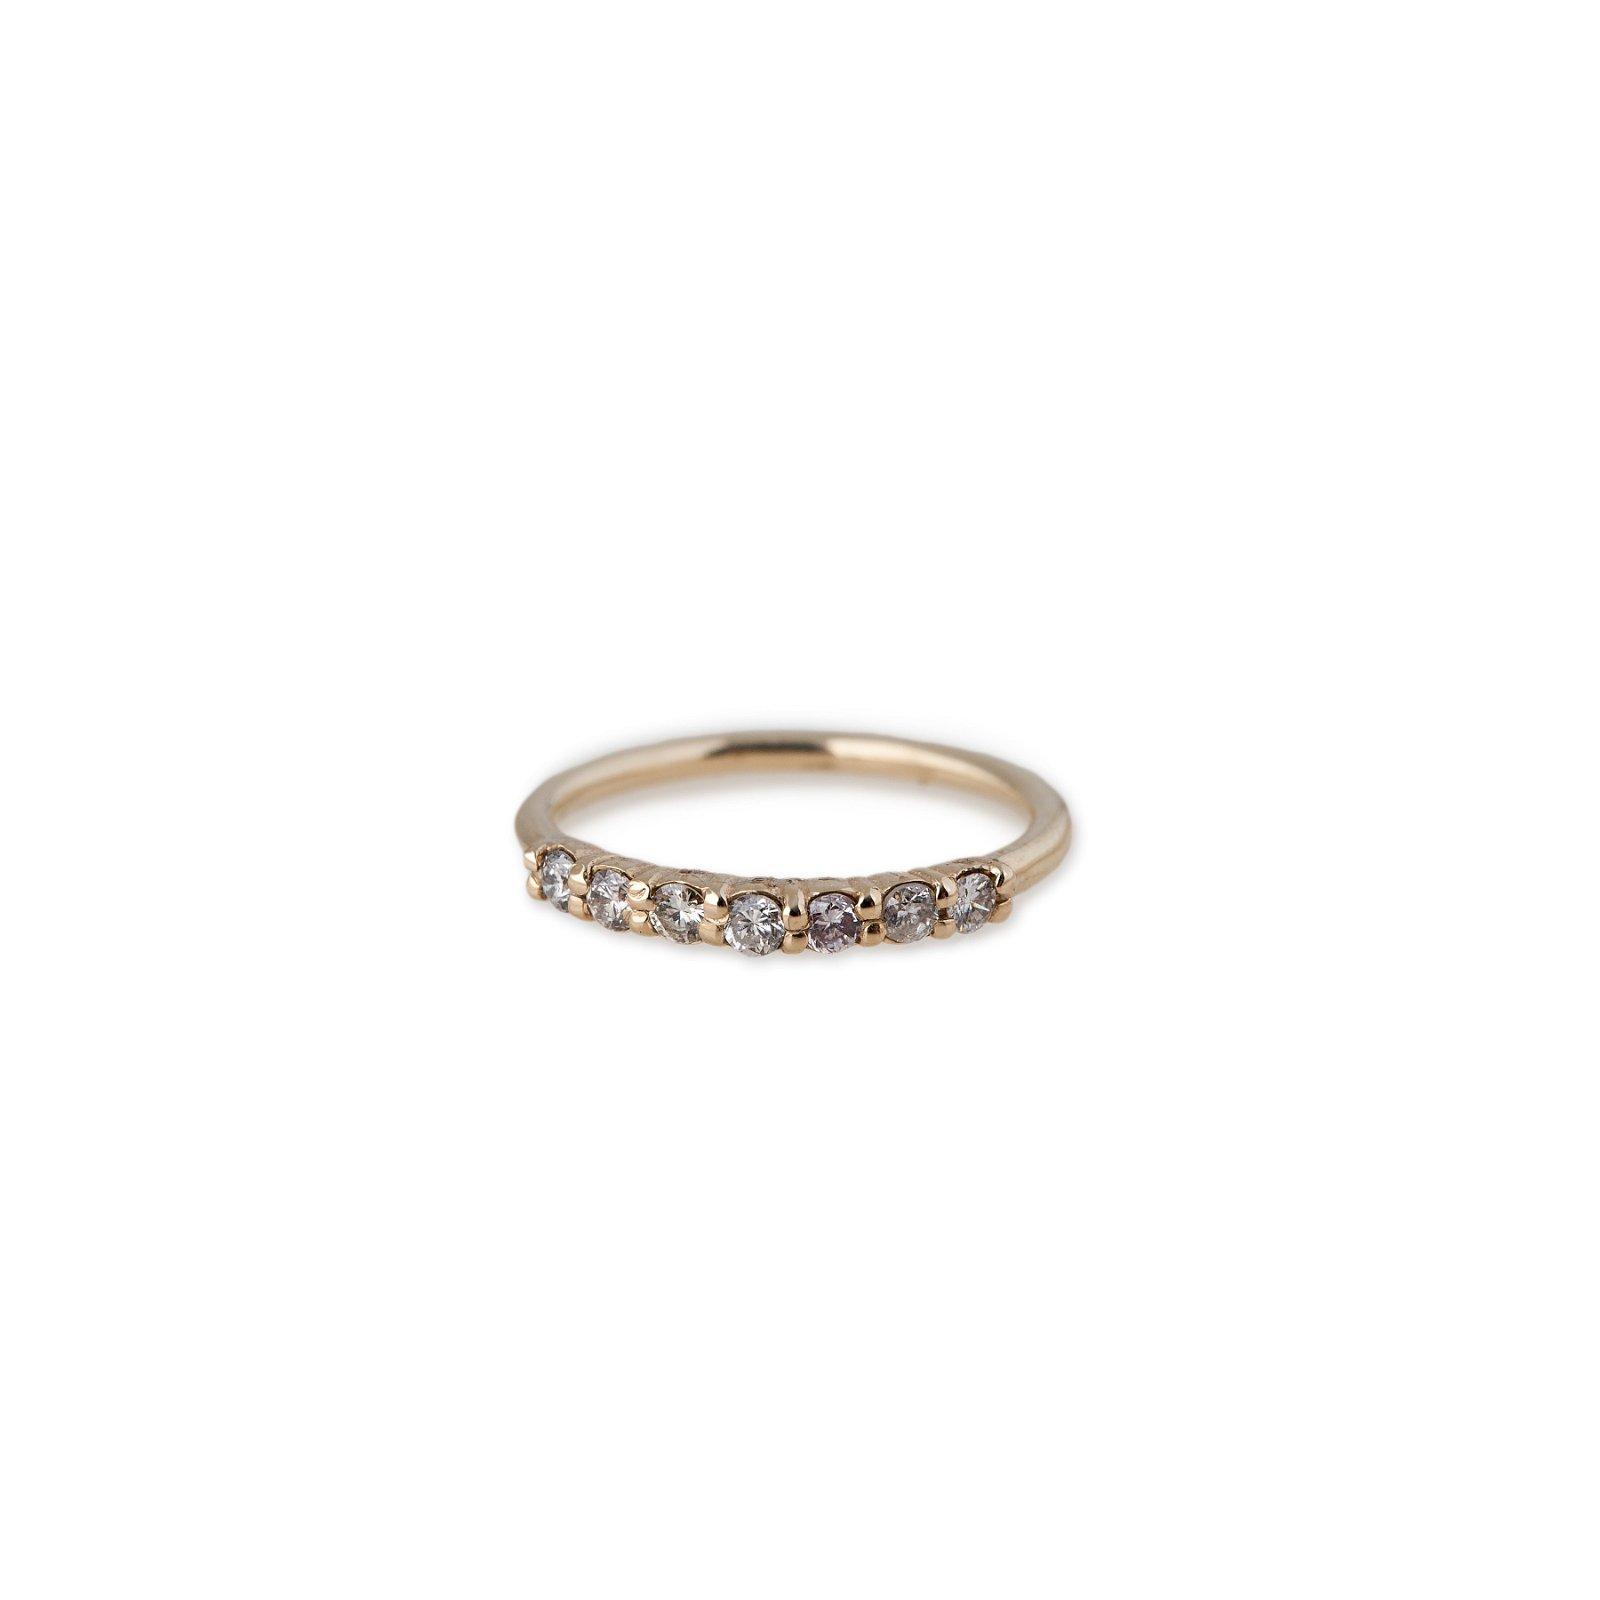 Image of 7 DIAMOND SMOOTH RING